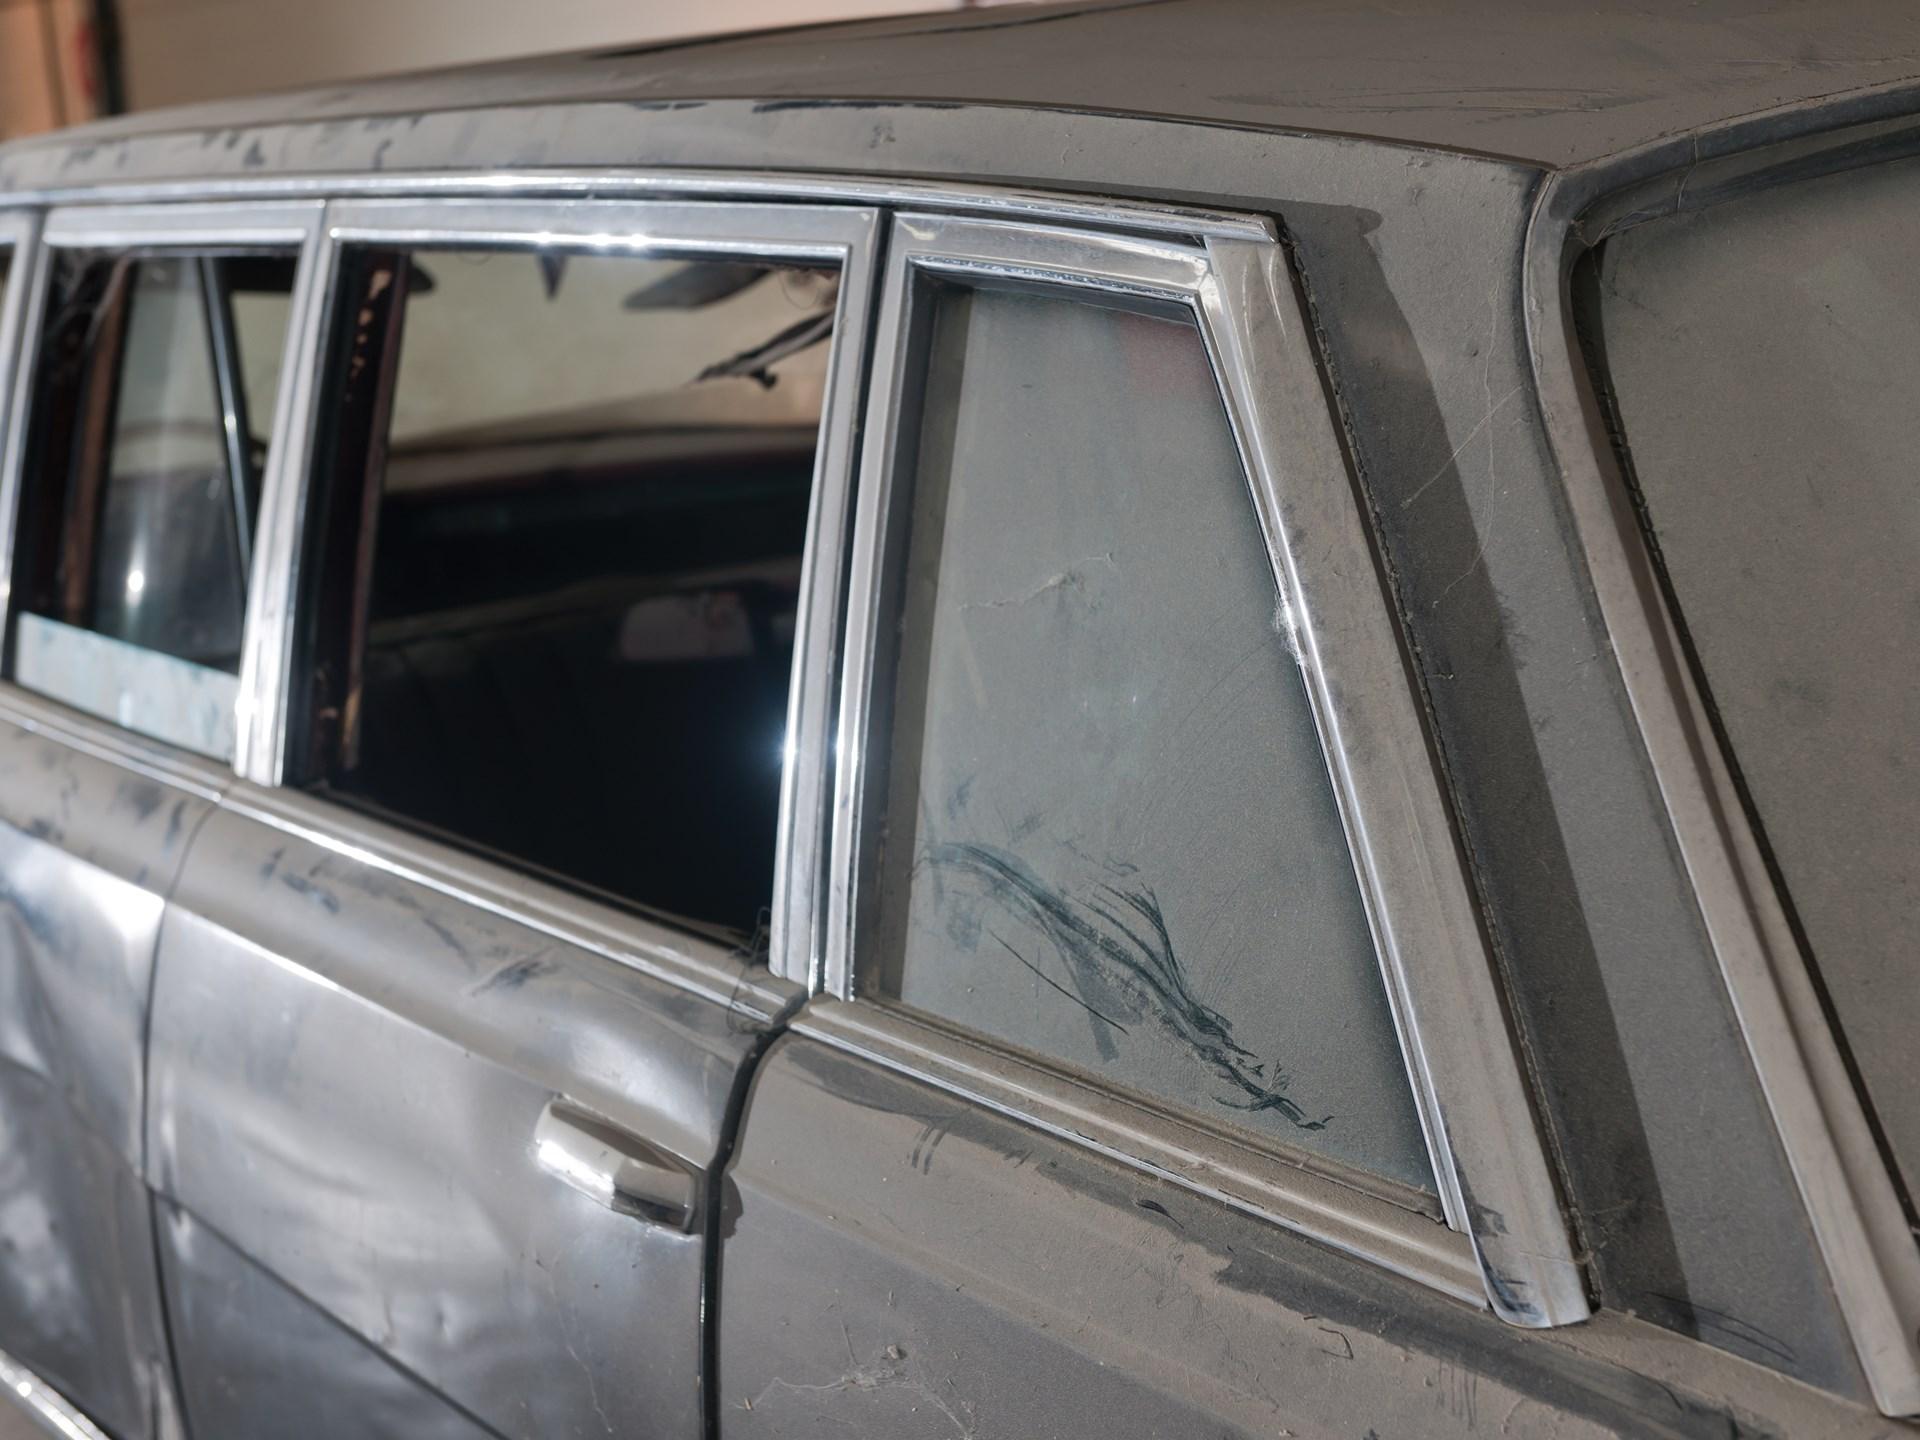 1969 Mercedes-Benz 600 Pullman Limousine